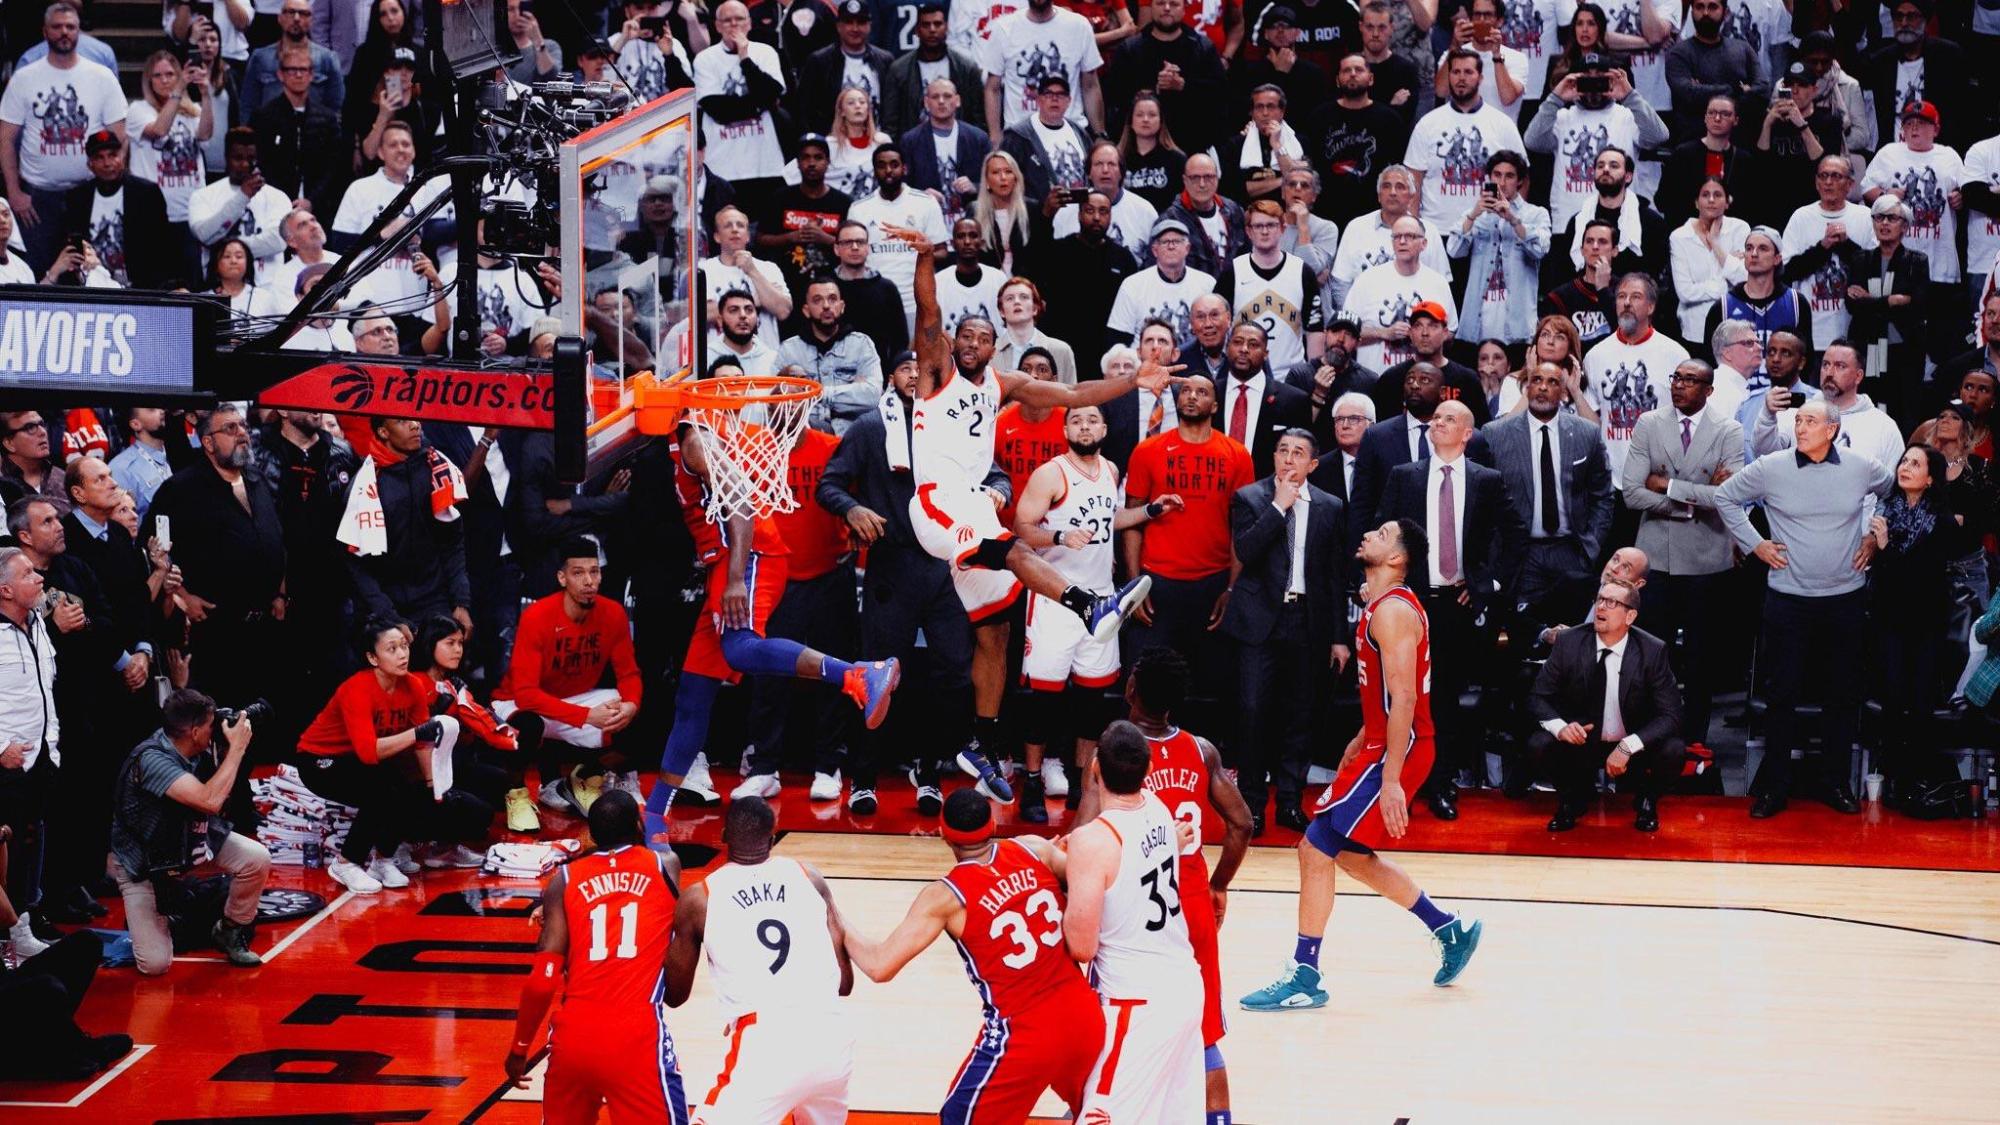 NBA官方出品 必属精品 要的就是大心脏 玩的就是心跳 一次看过瘾 最近五个赛季精彩压哨绝杀球集锦